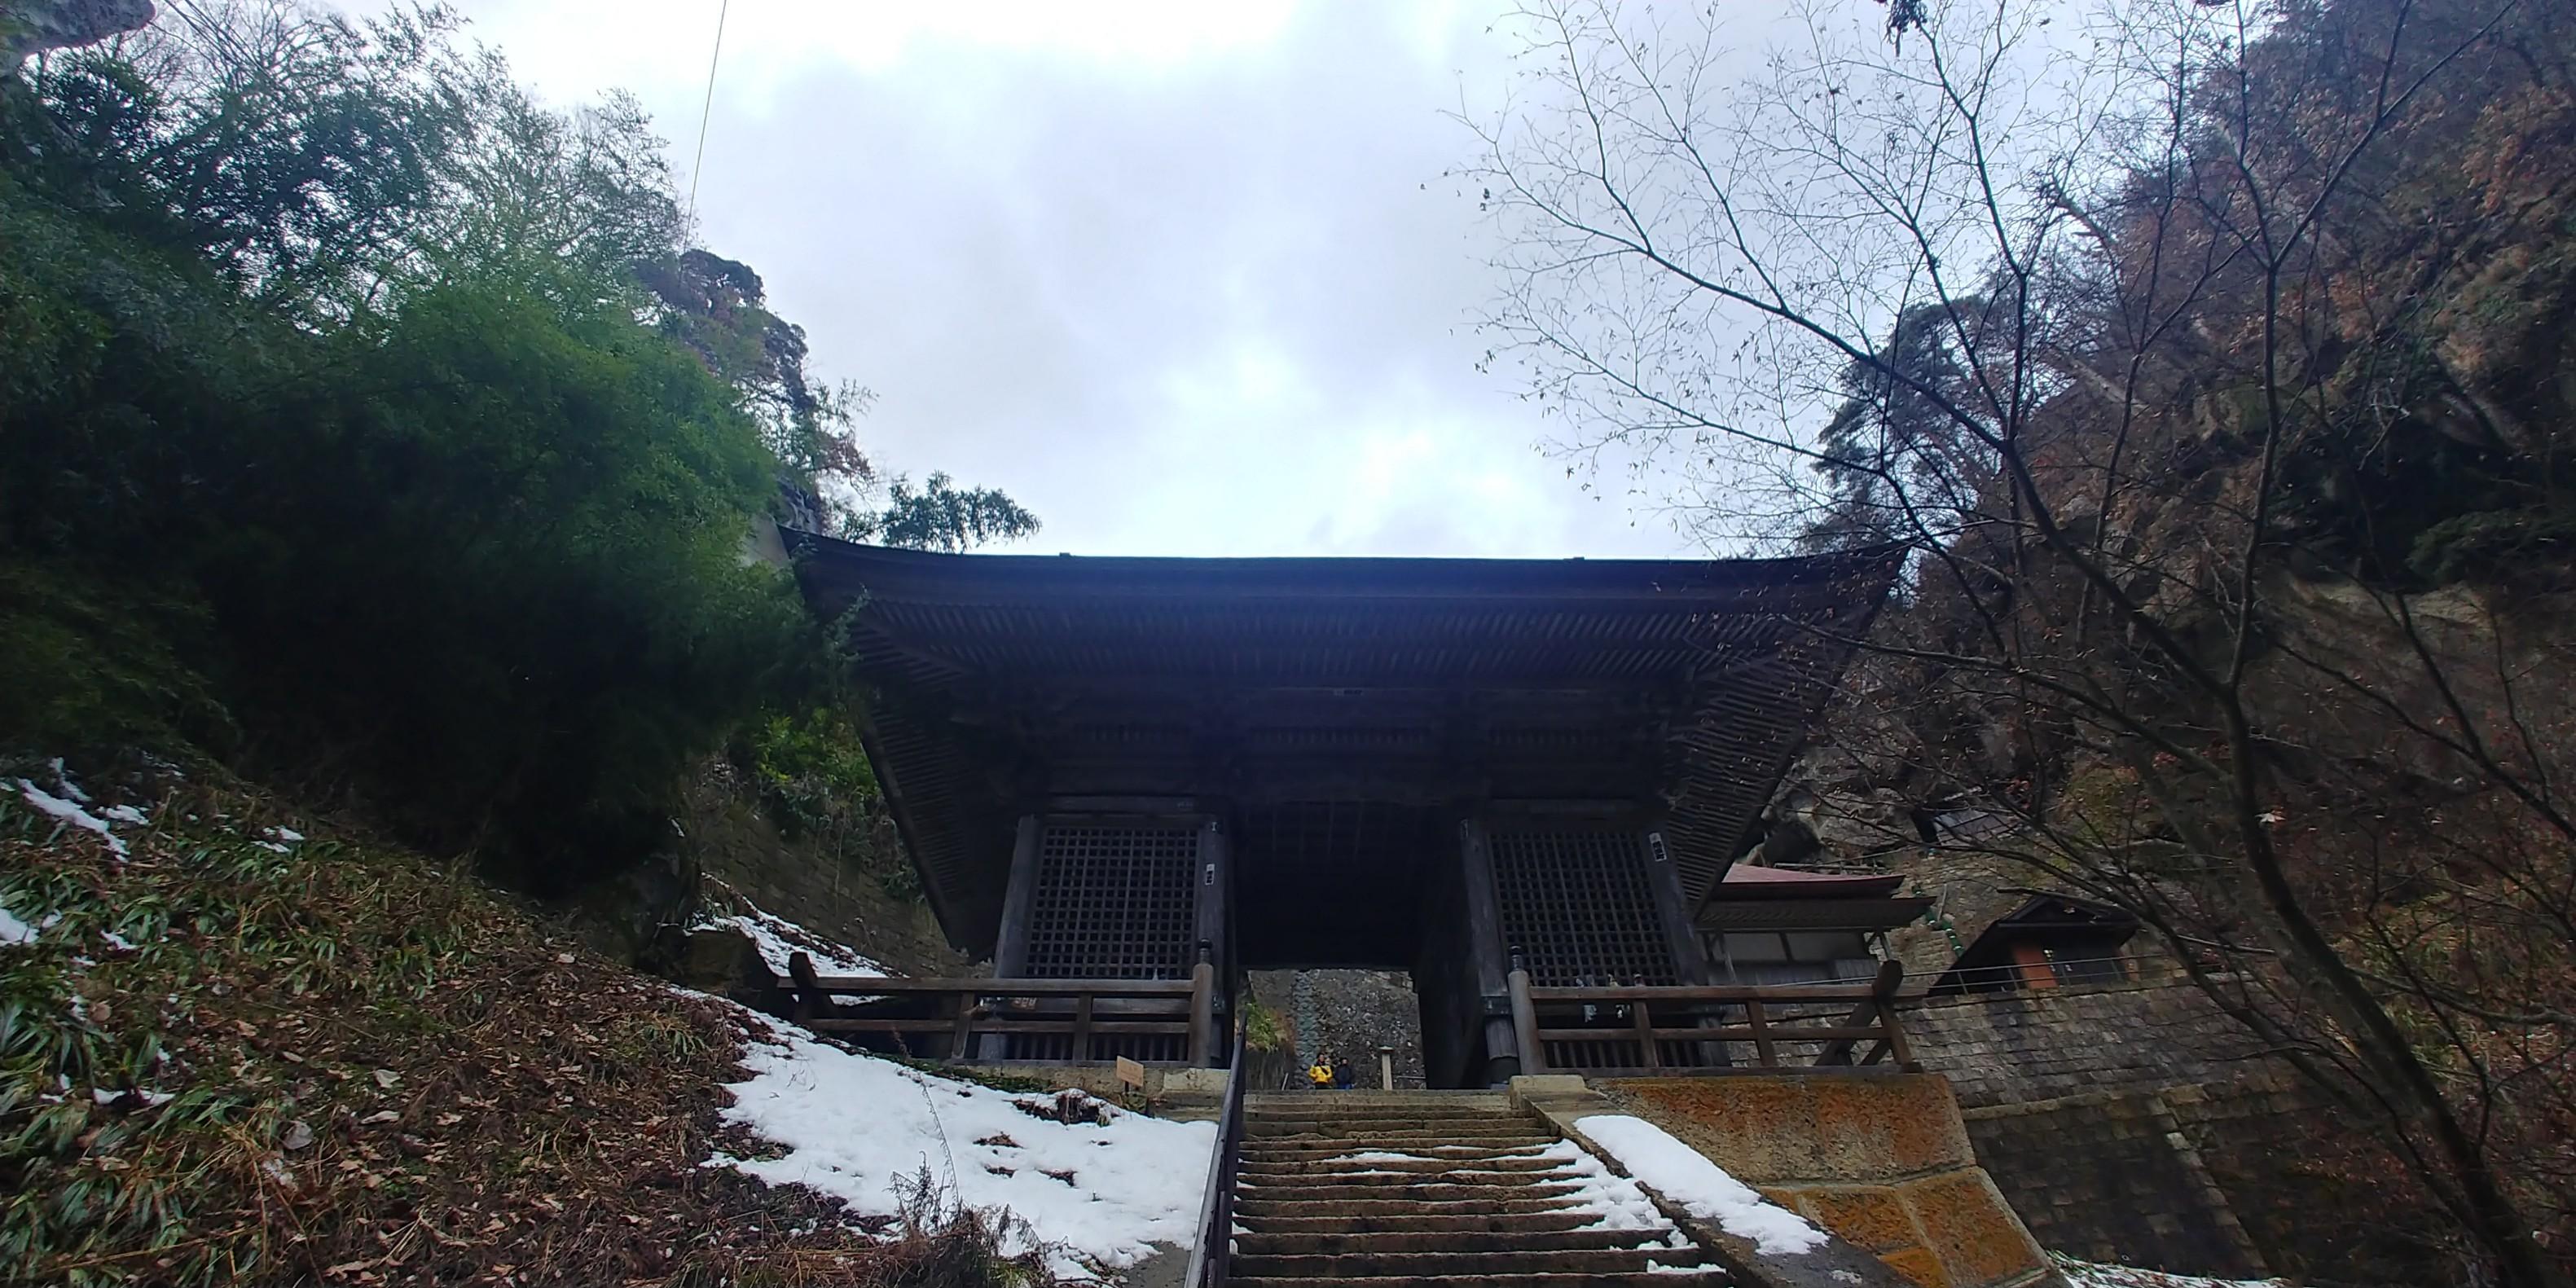 f:id:kishuji-kaisoku:20200127111820j:image